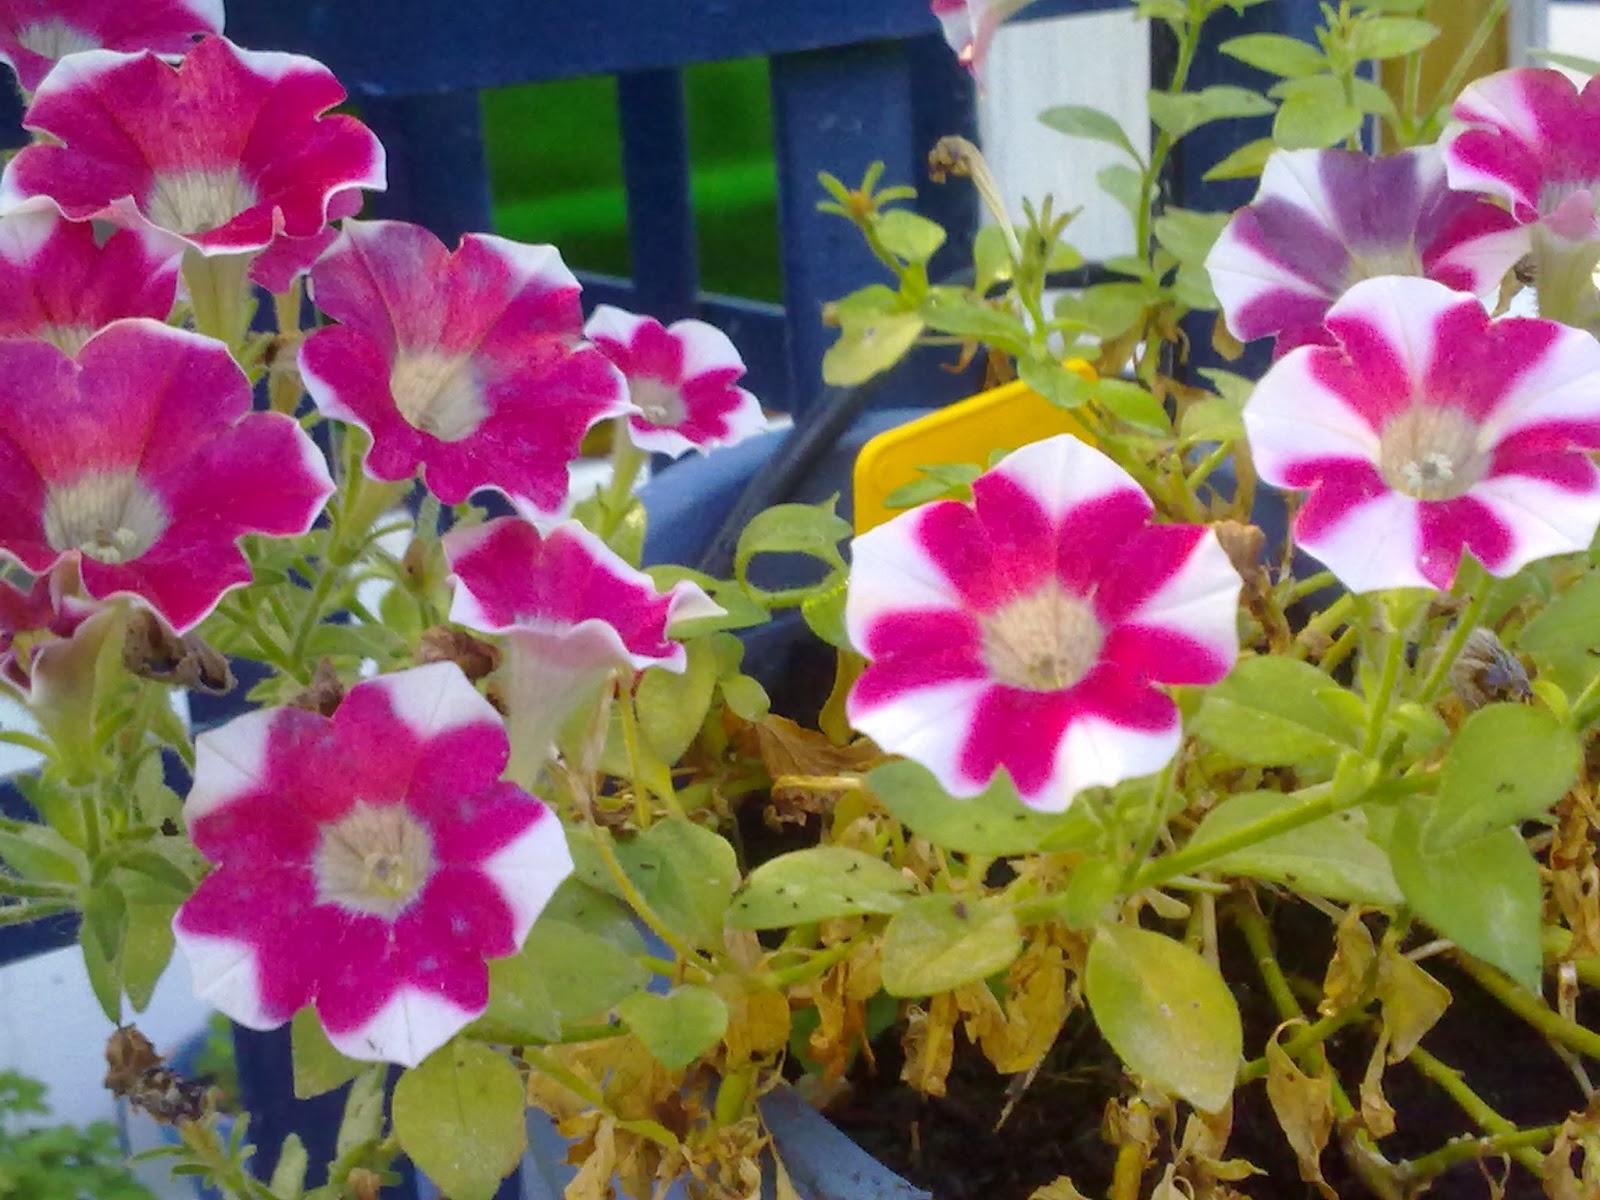 Uruguay natural internacional chacra lxxxv jardin - Plantas de temporada primavera ...